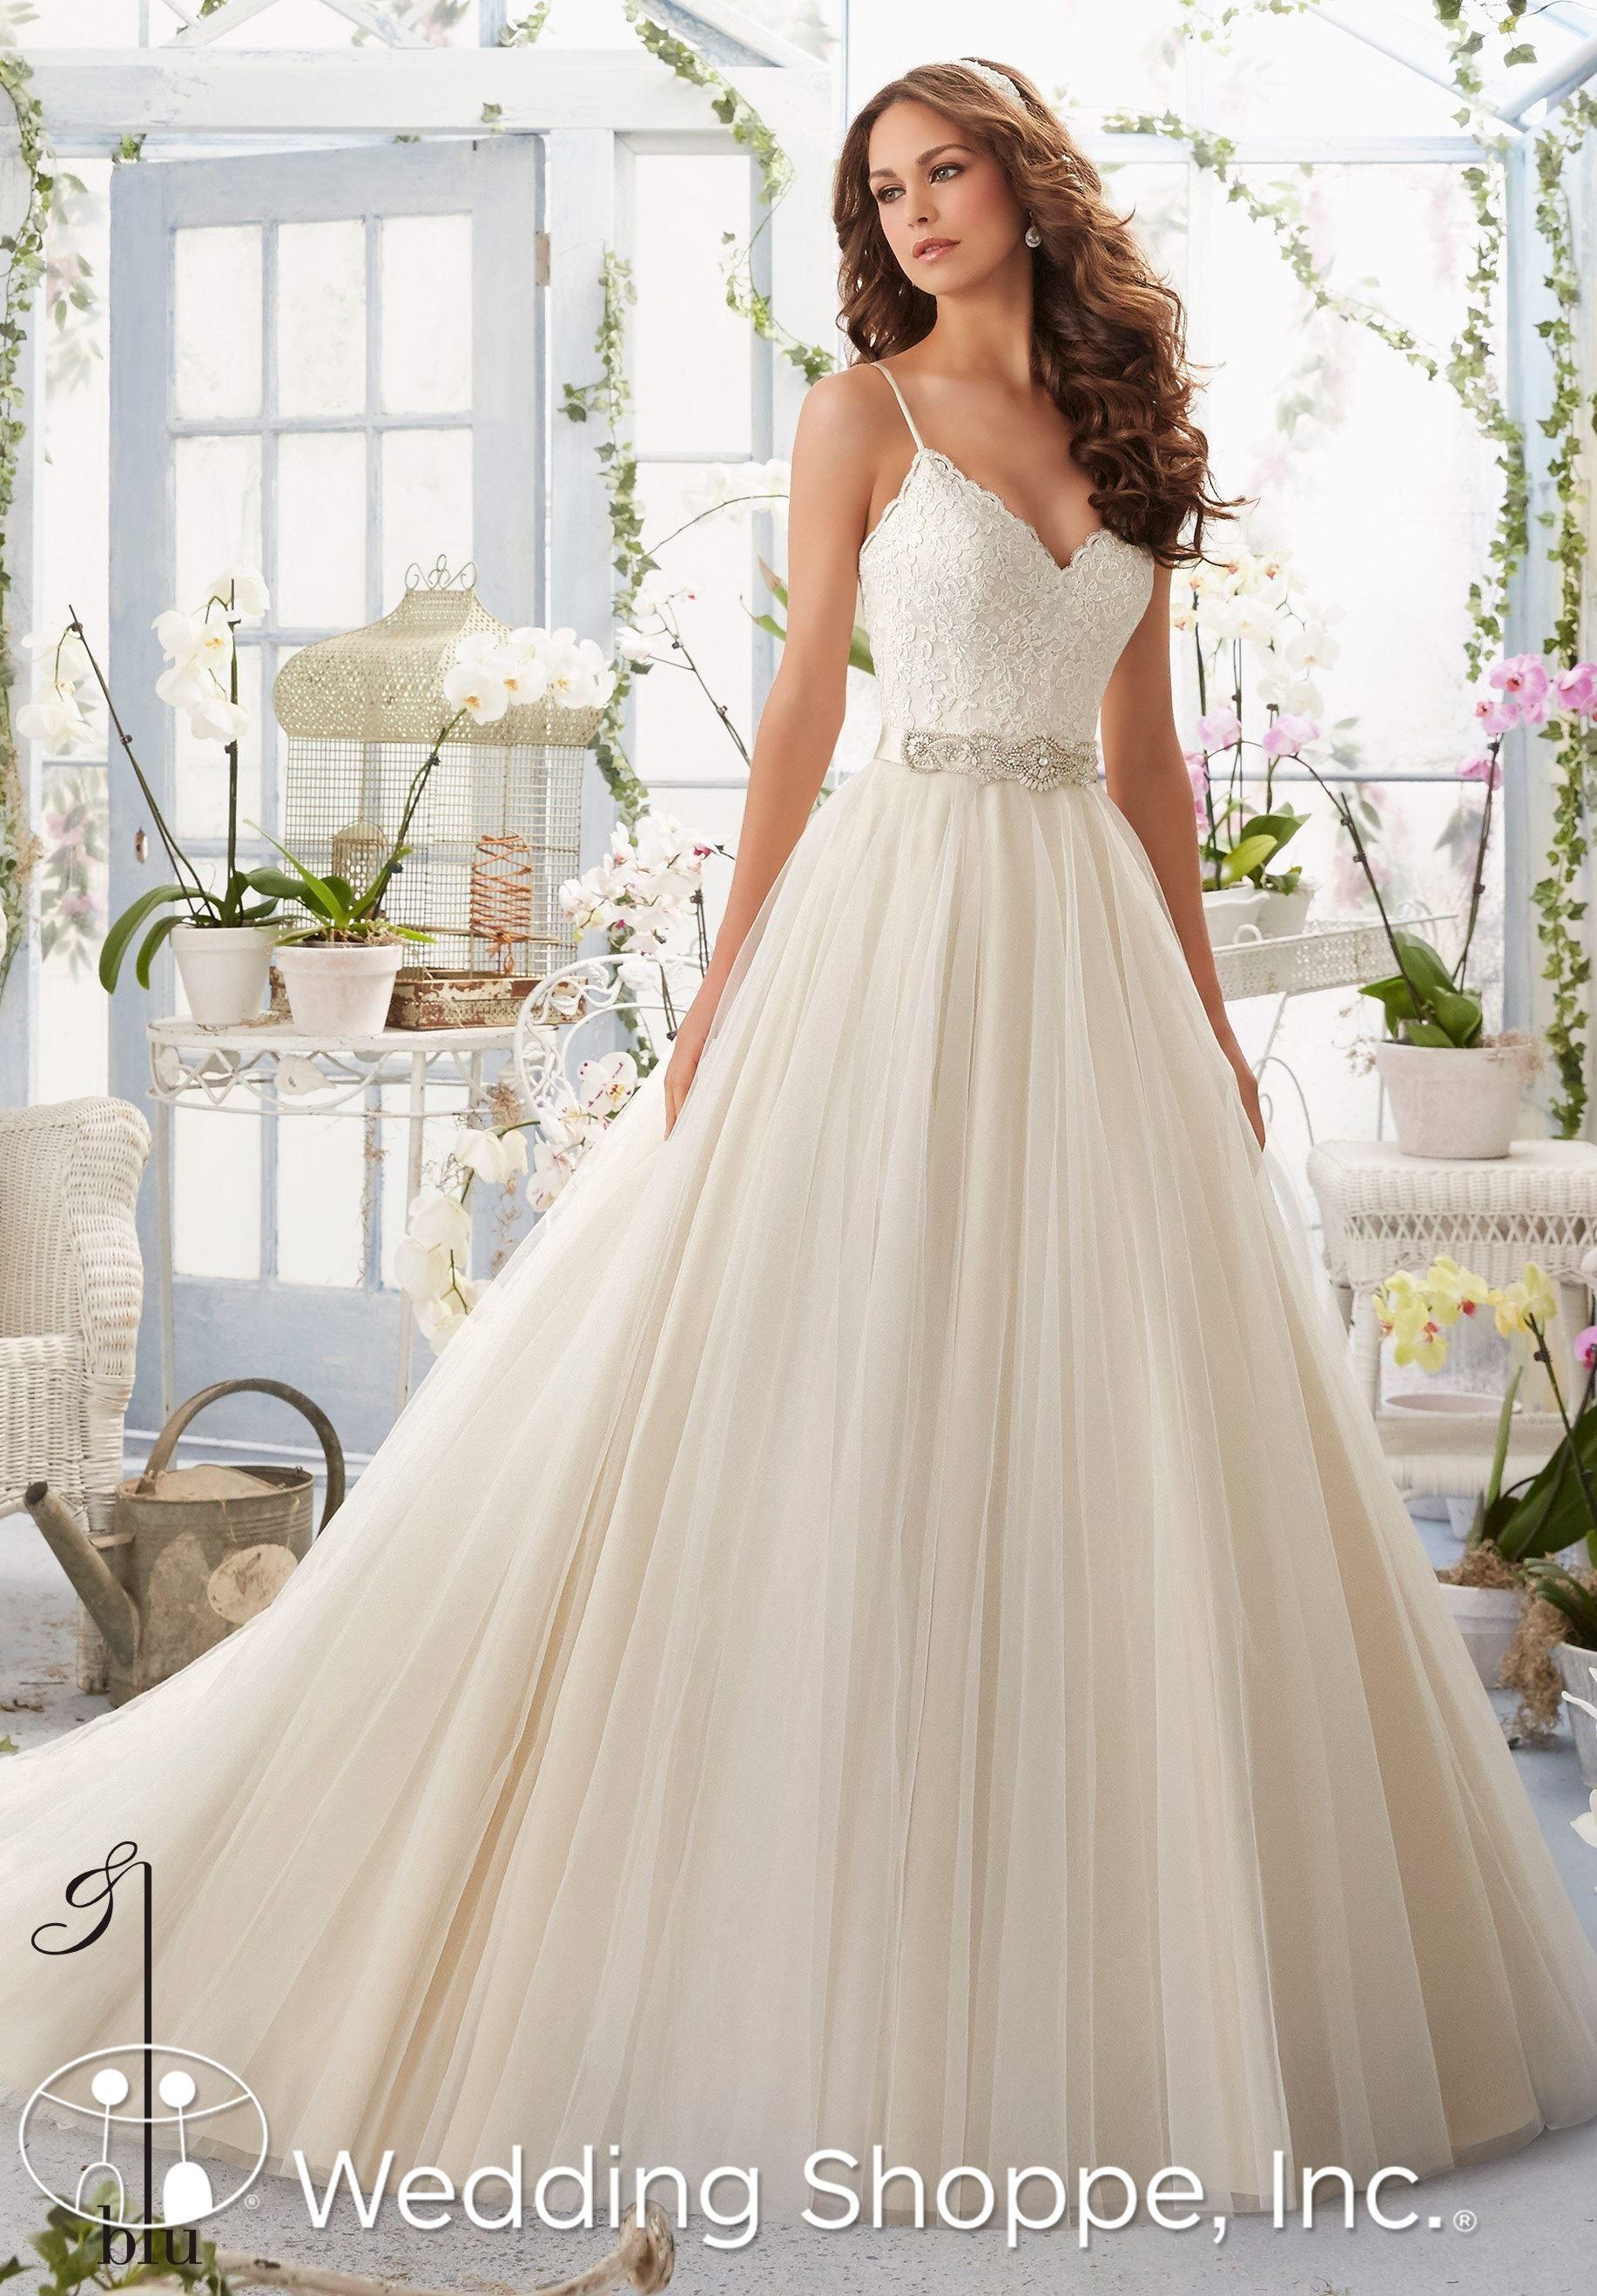 Mori lee gold wedding dress  A romantic lace and tulle wedding dress with beaded belt  Wedding